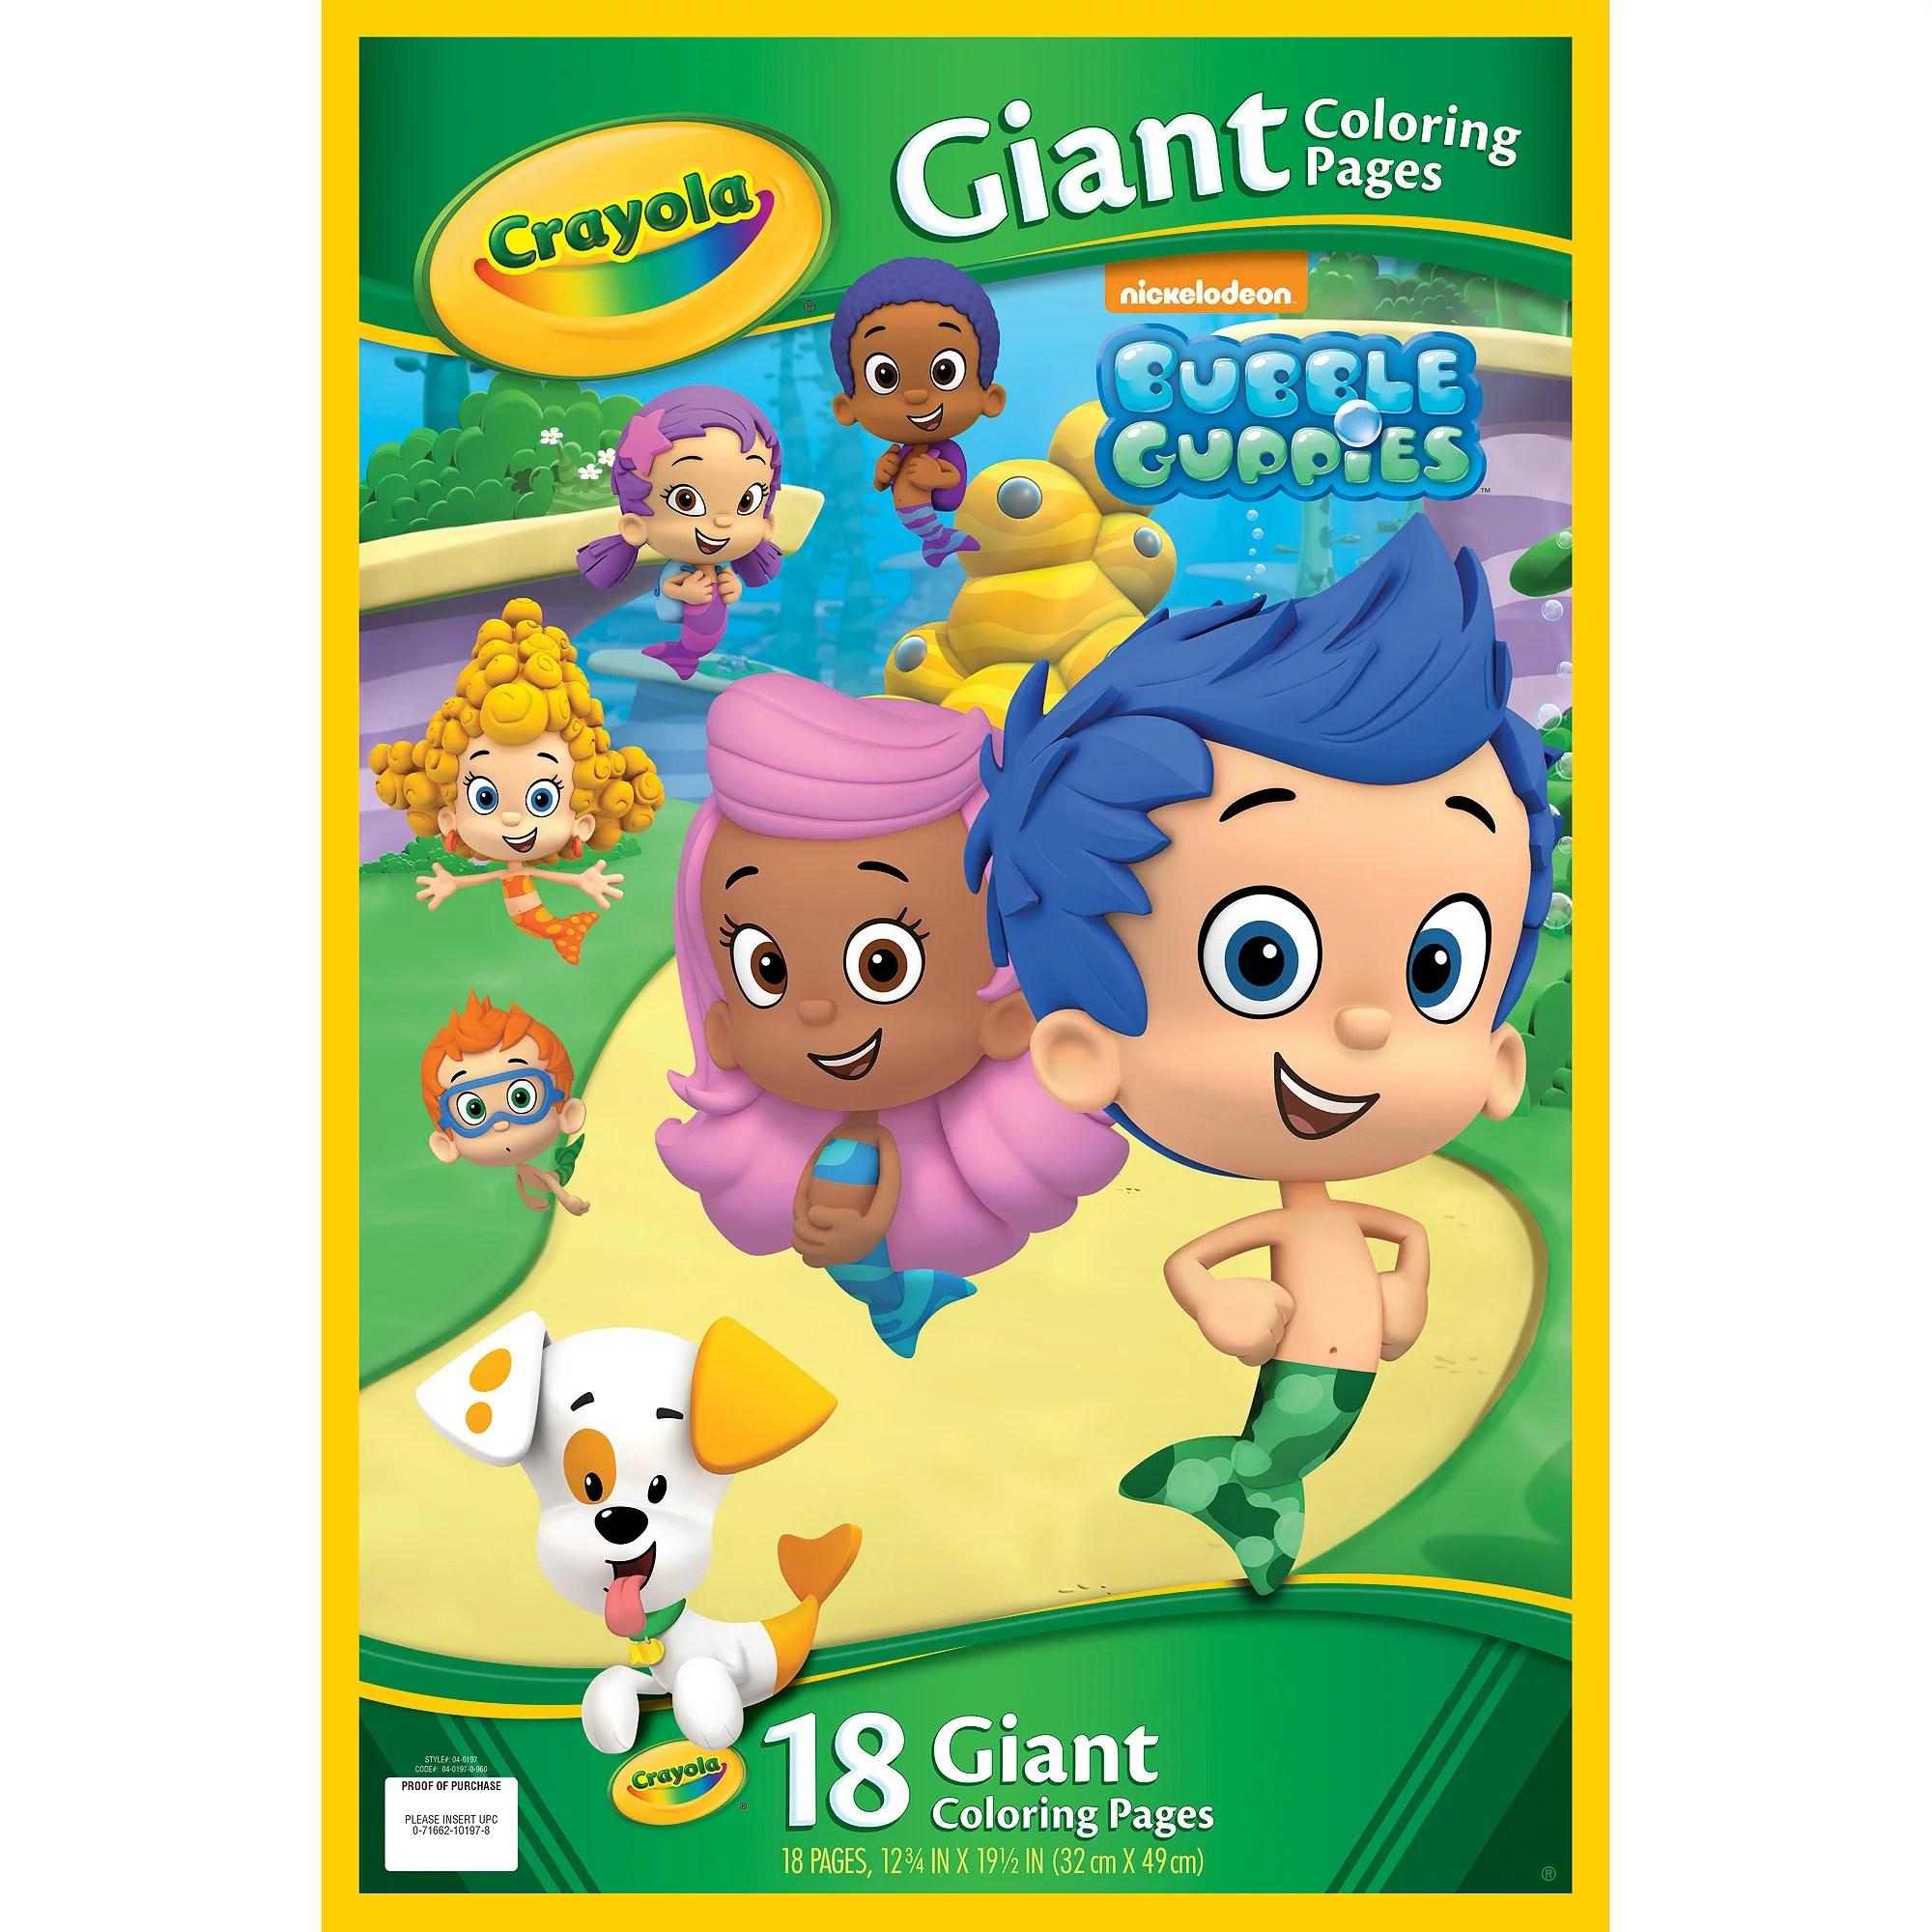 Crayola Giant Coloring Pages Bubble Guppies Walmart Com Walmart Com